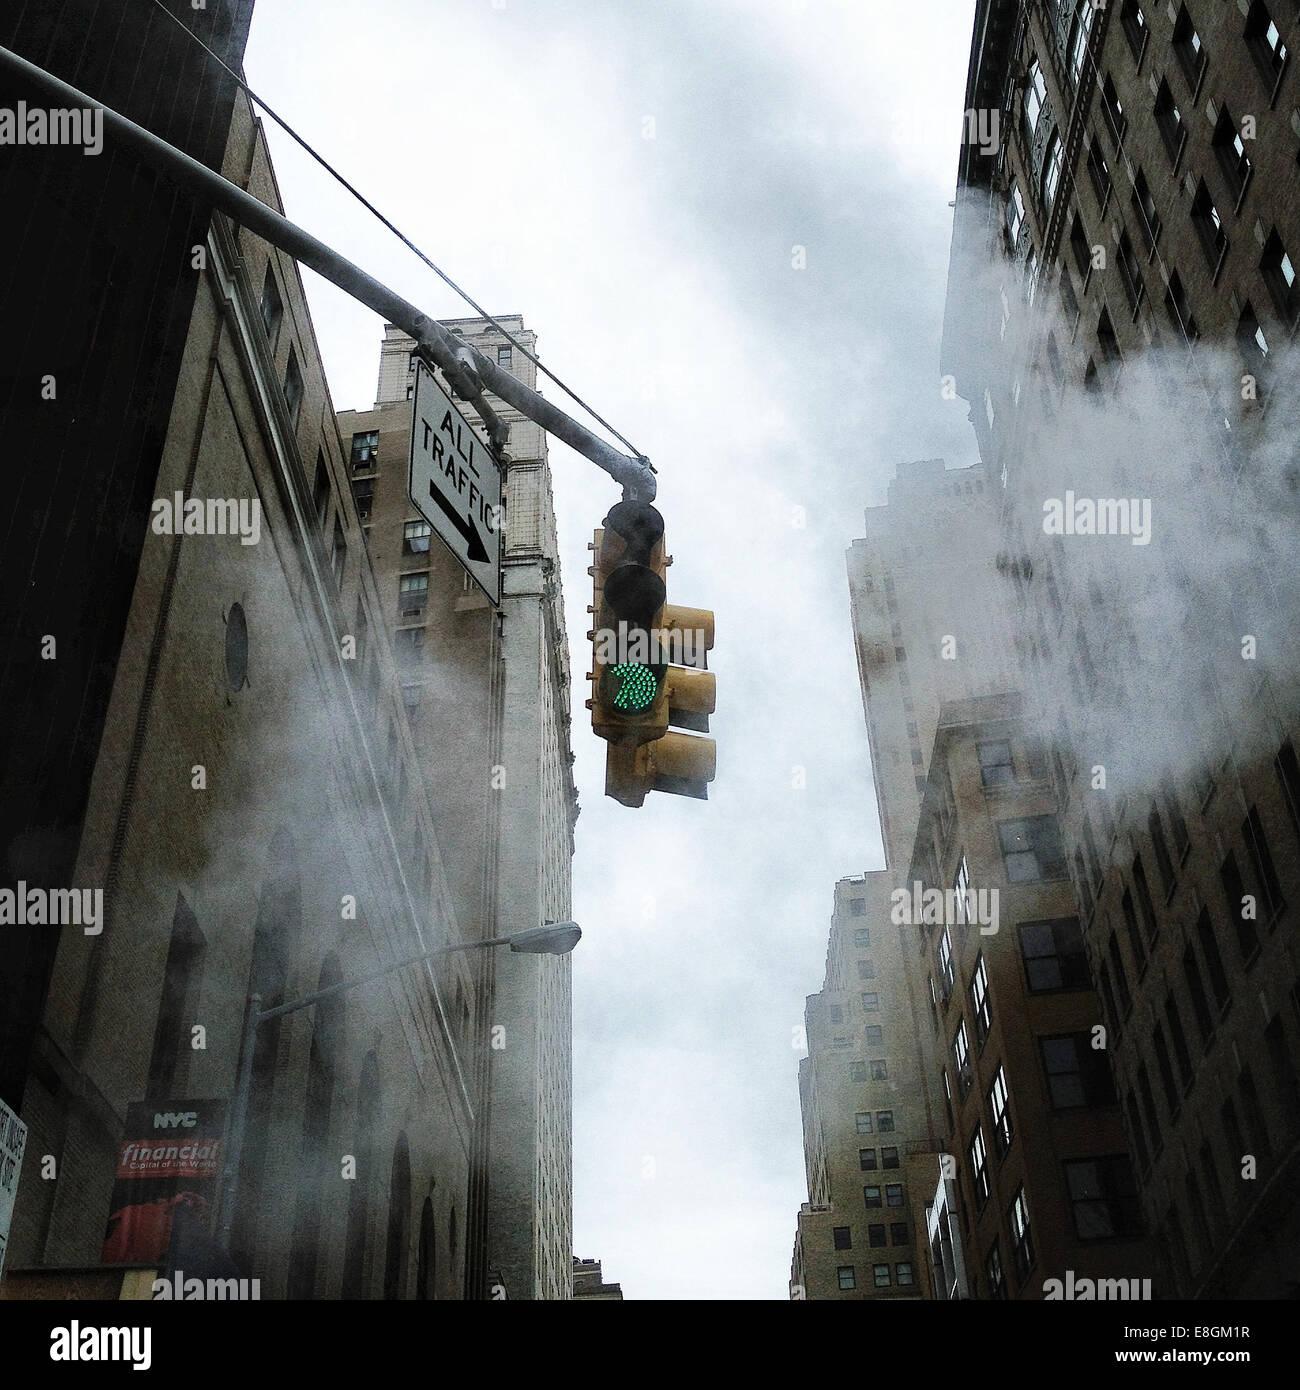 USA, New York, Traffic light - Stock Image